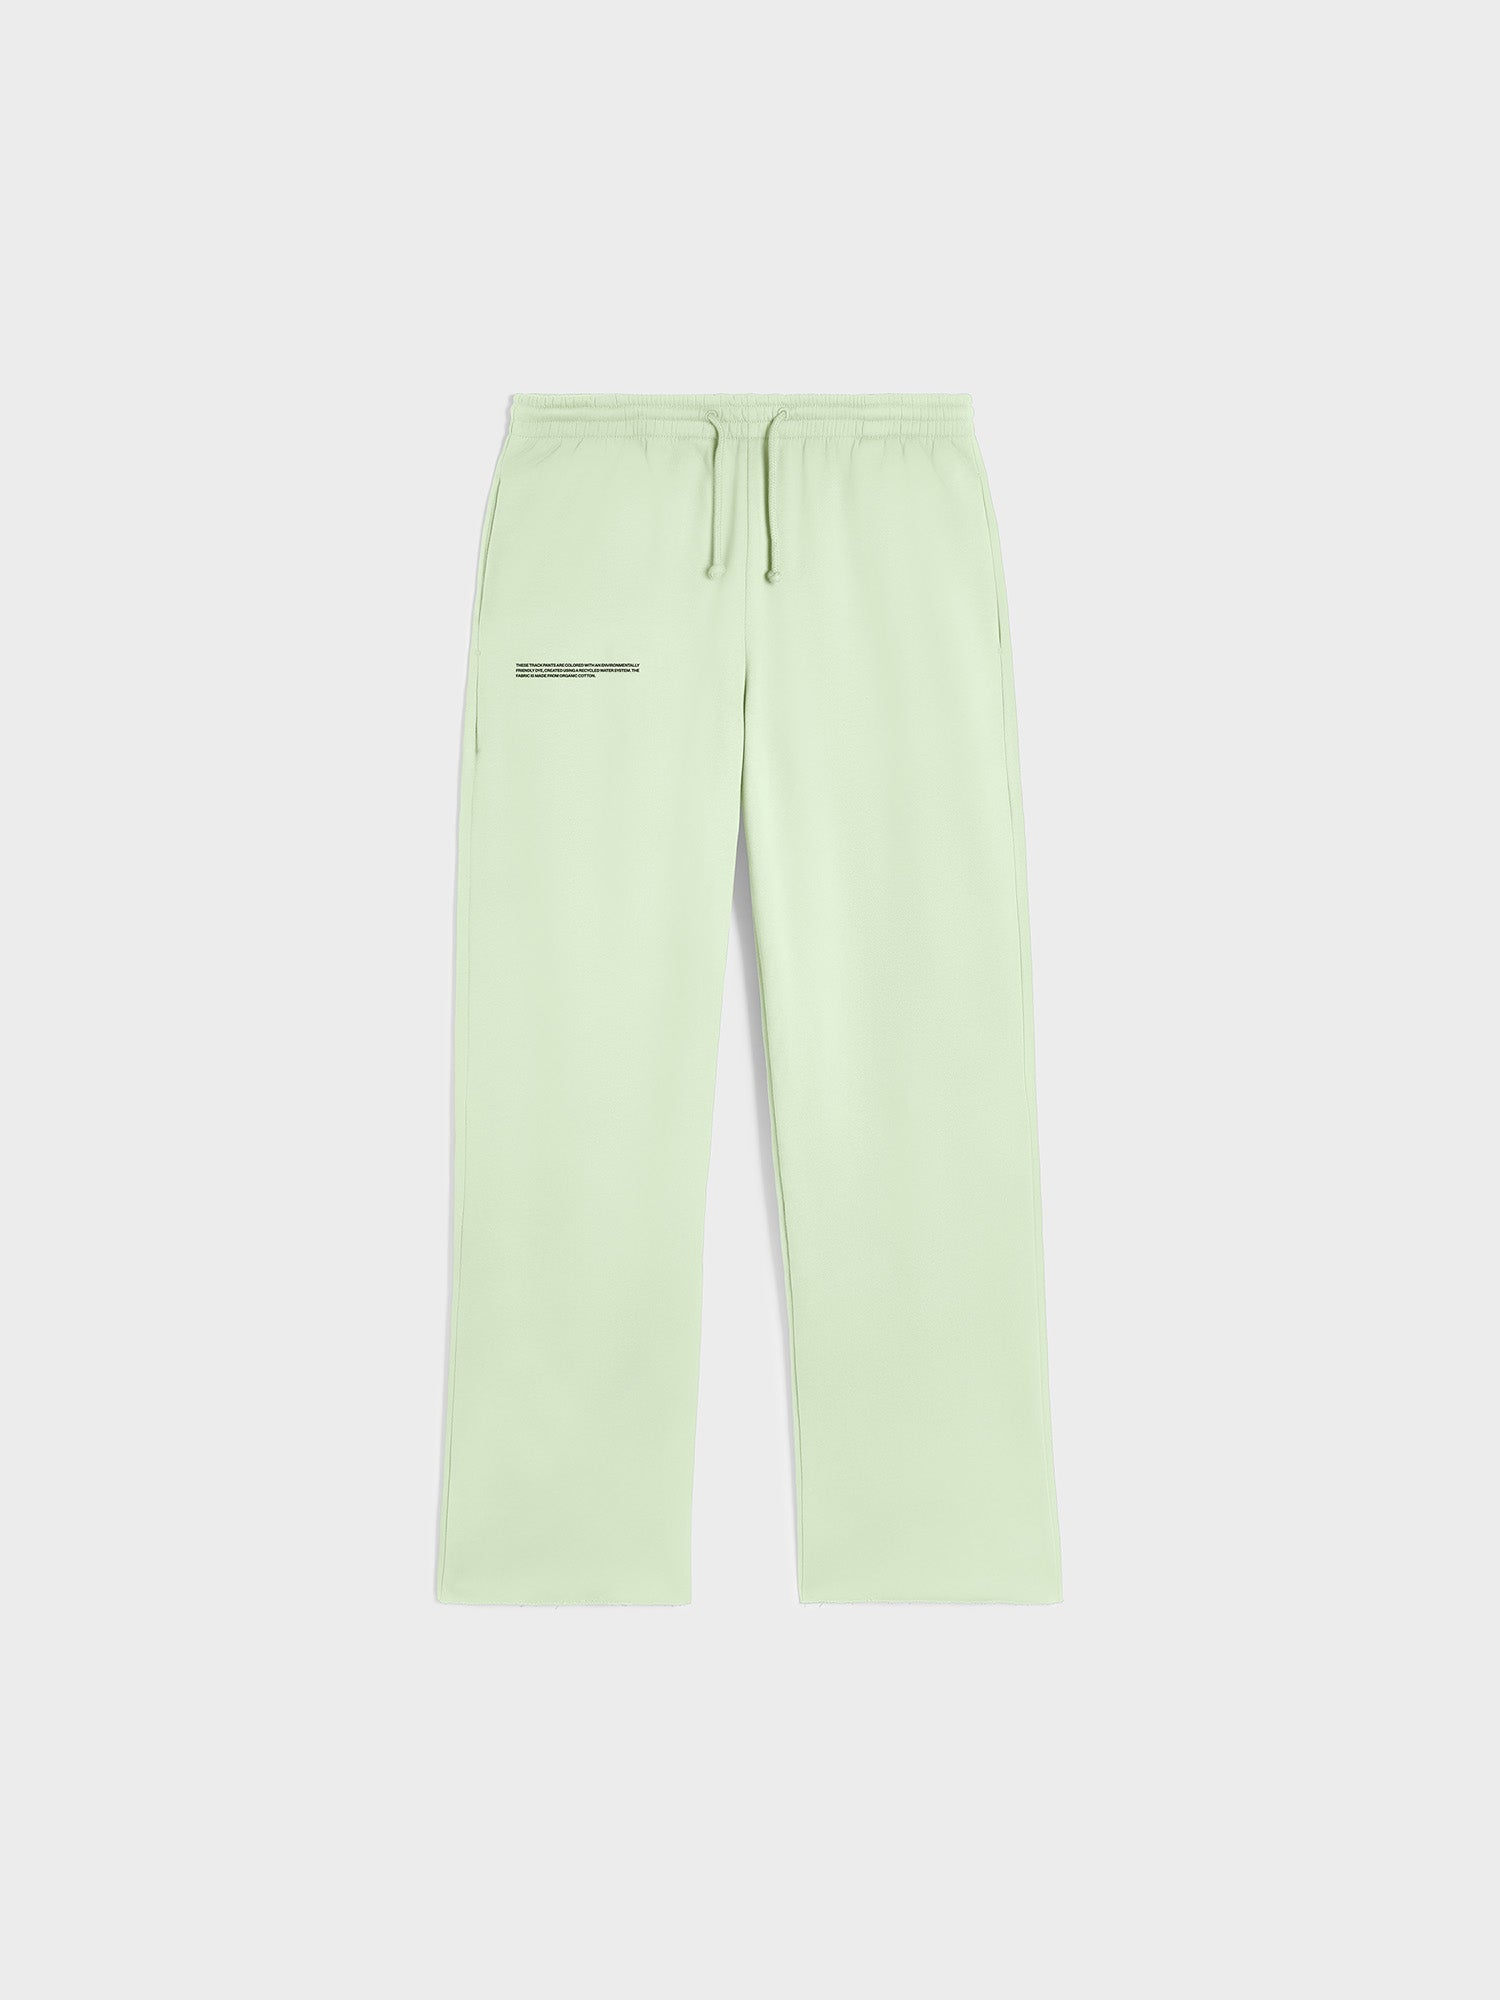 Organic cotton loose track pants